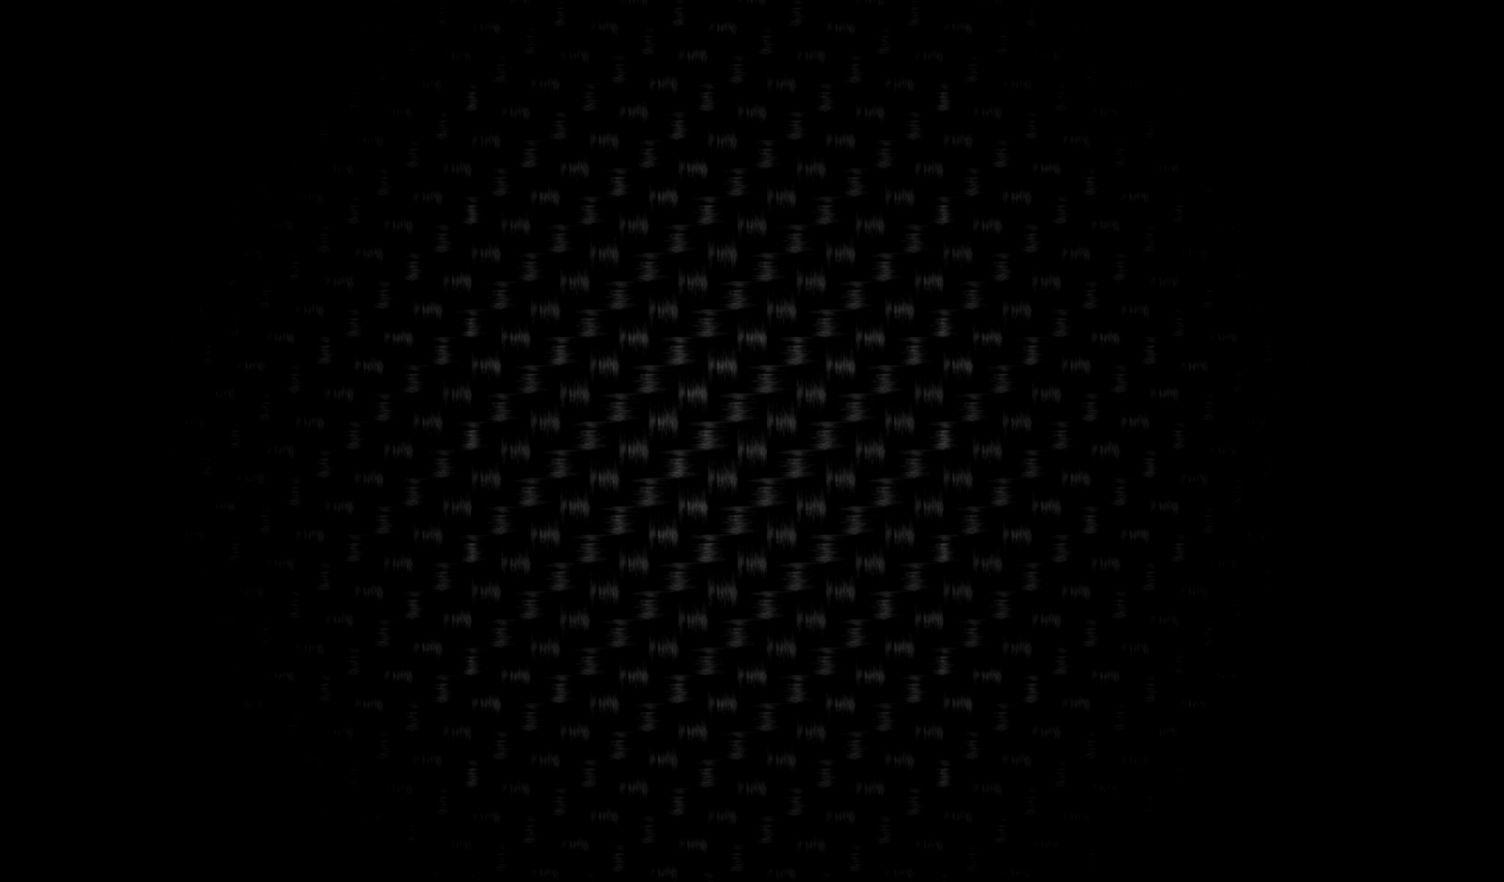 Unduh 600+ Wallpaper Black Hd Pc  Gratis